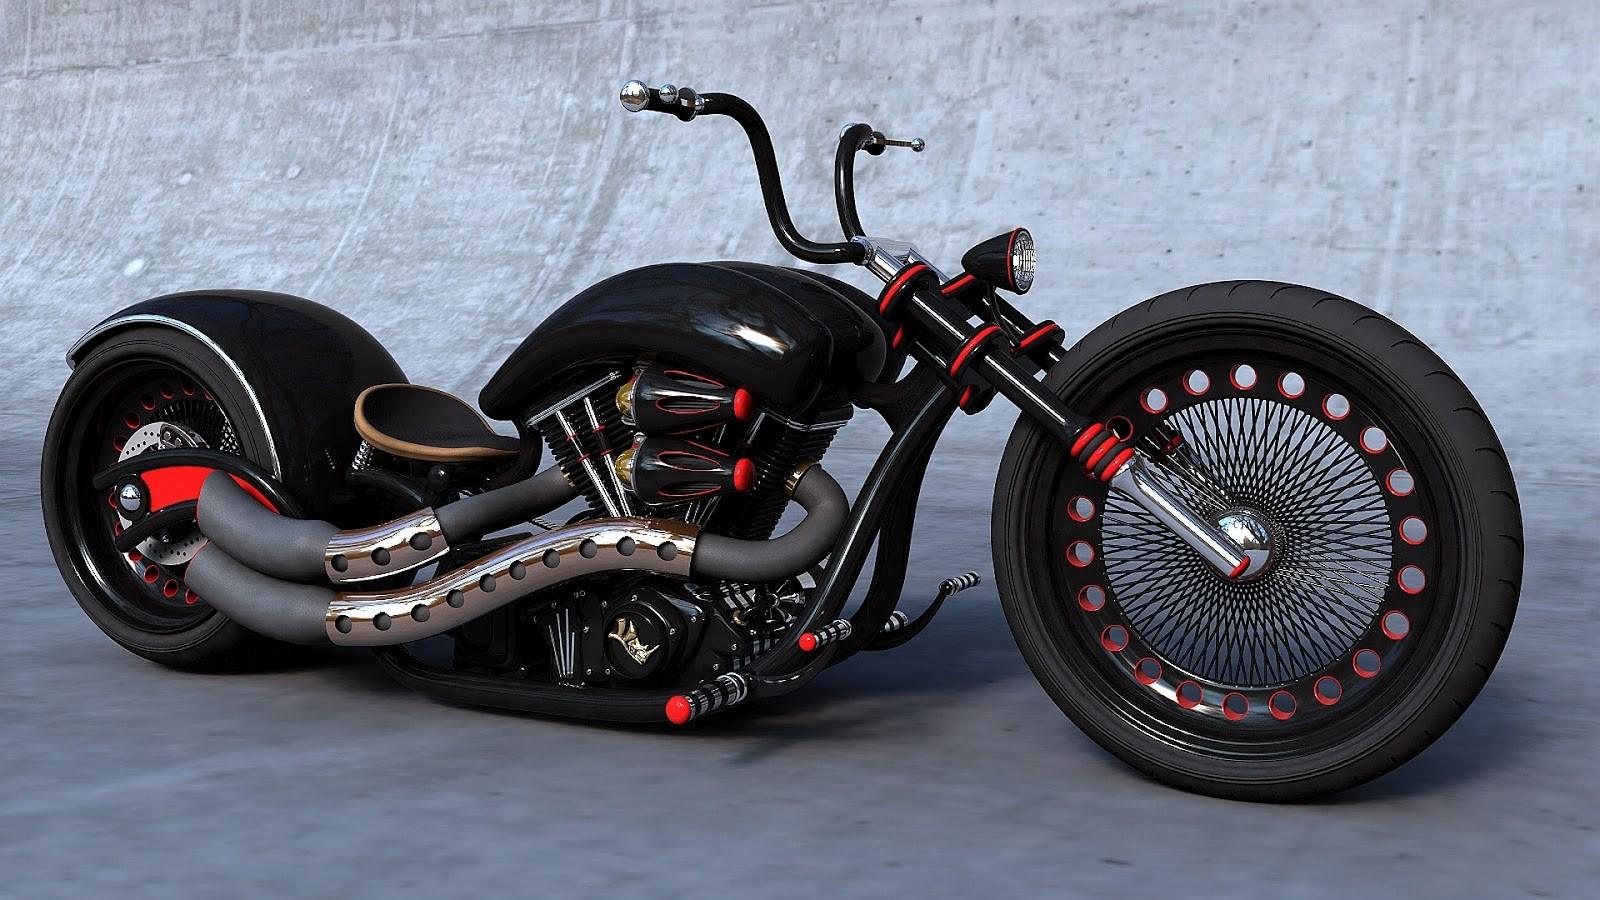 bikehd wallpapers of bike1080pcustomize chopper bike